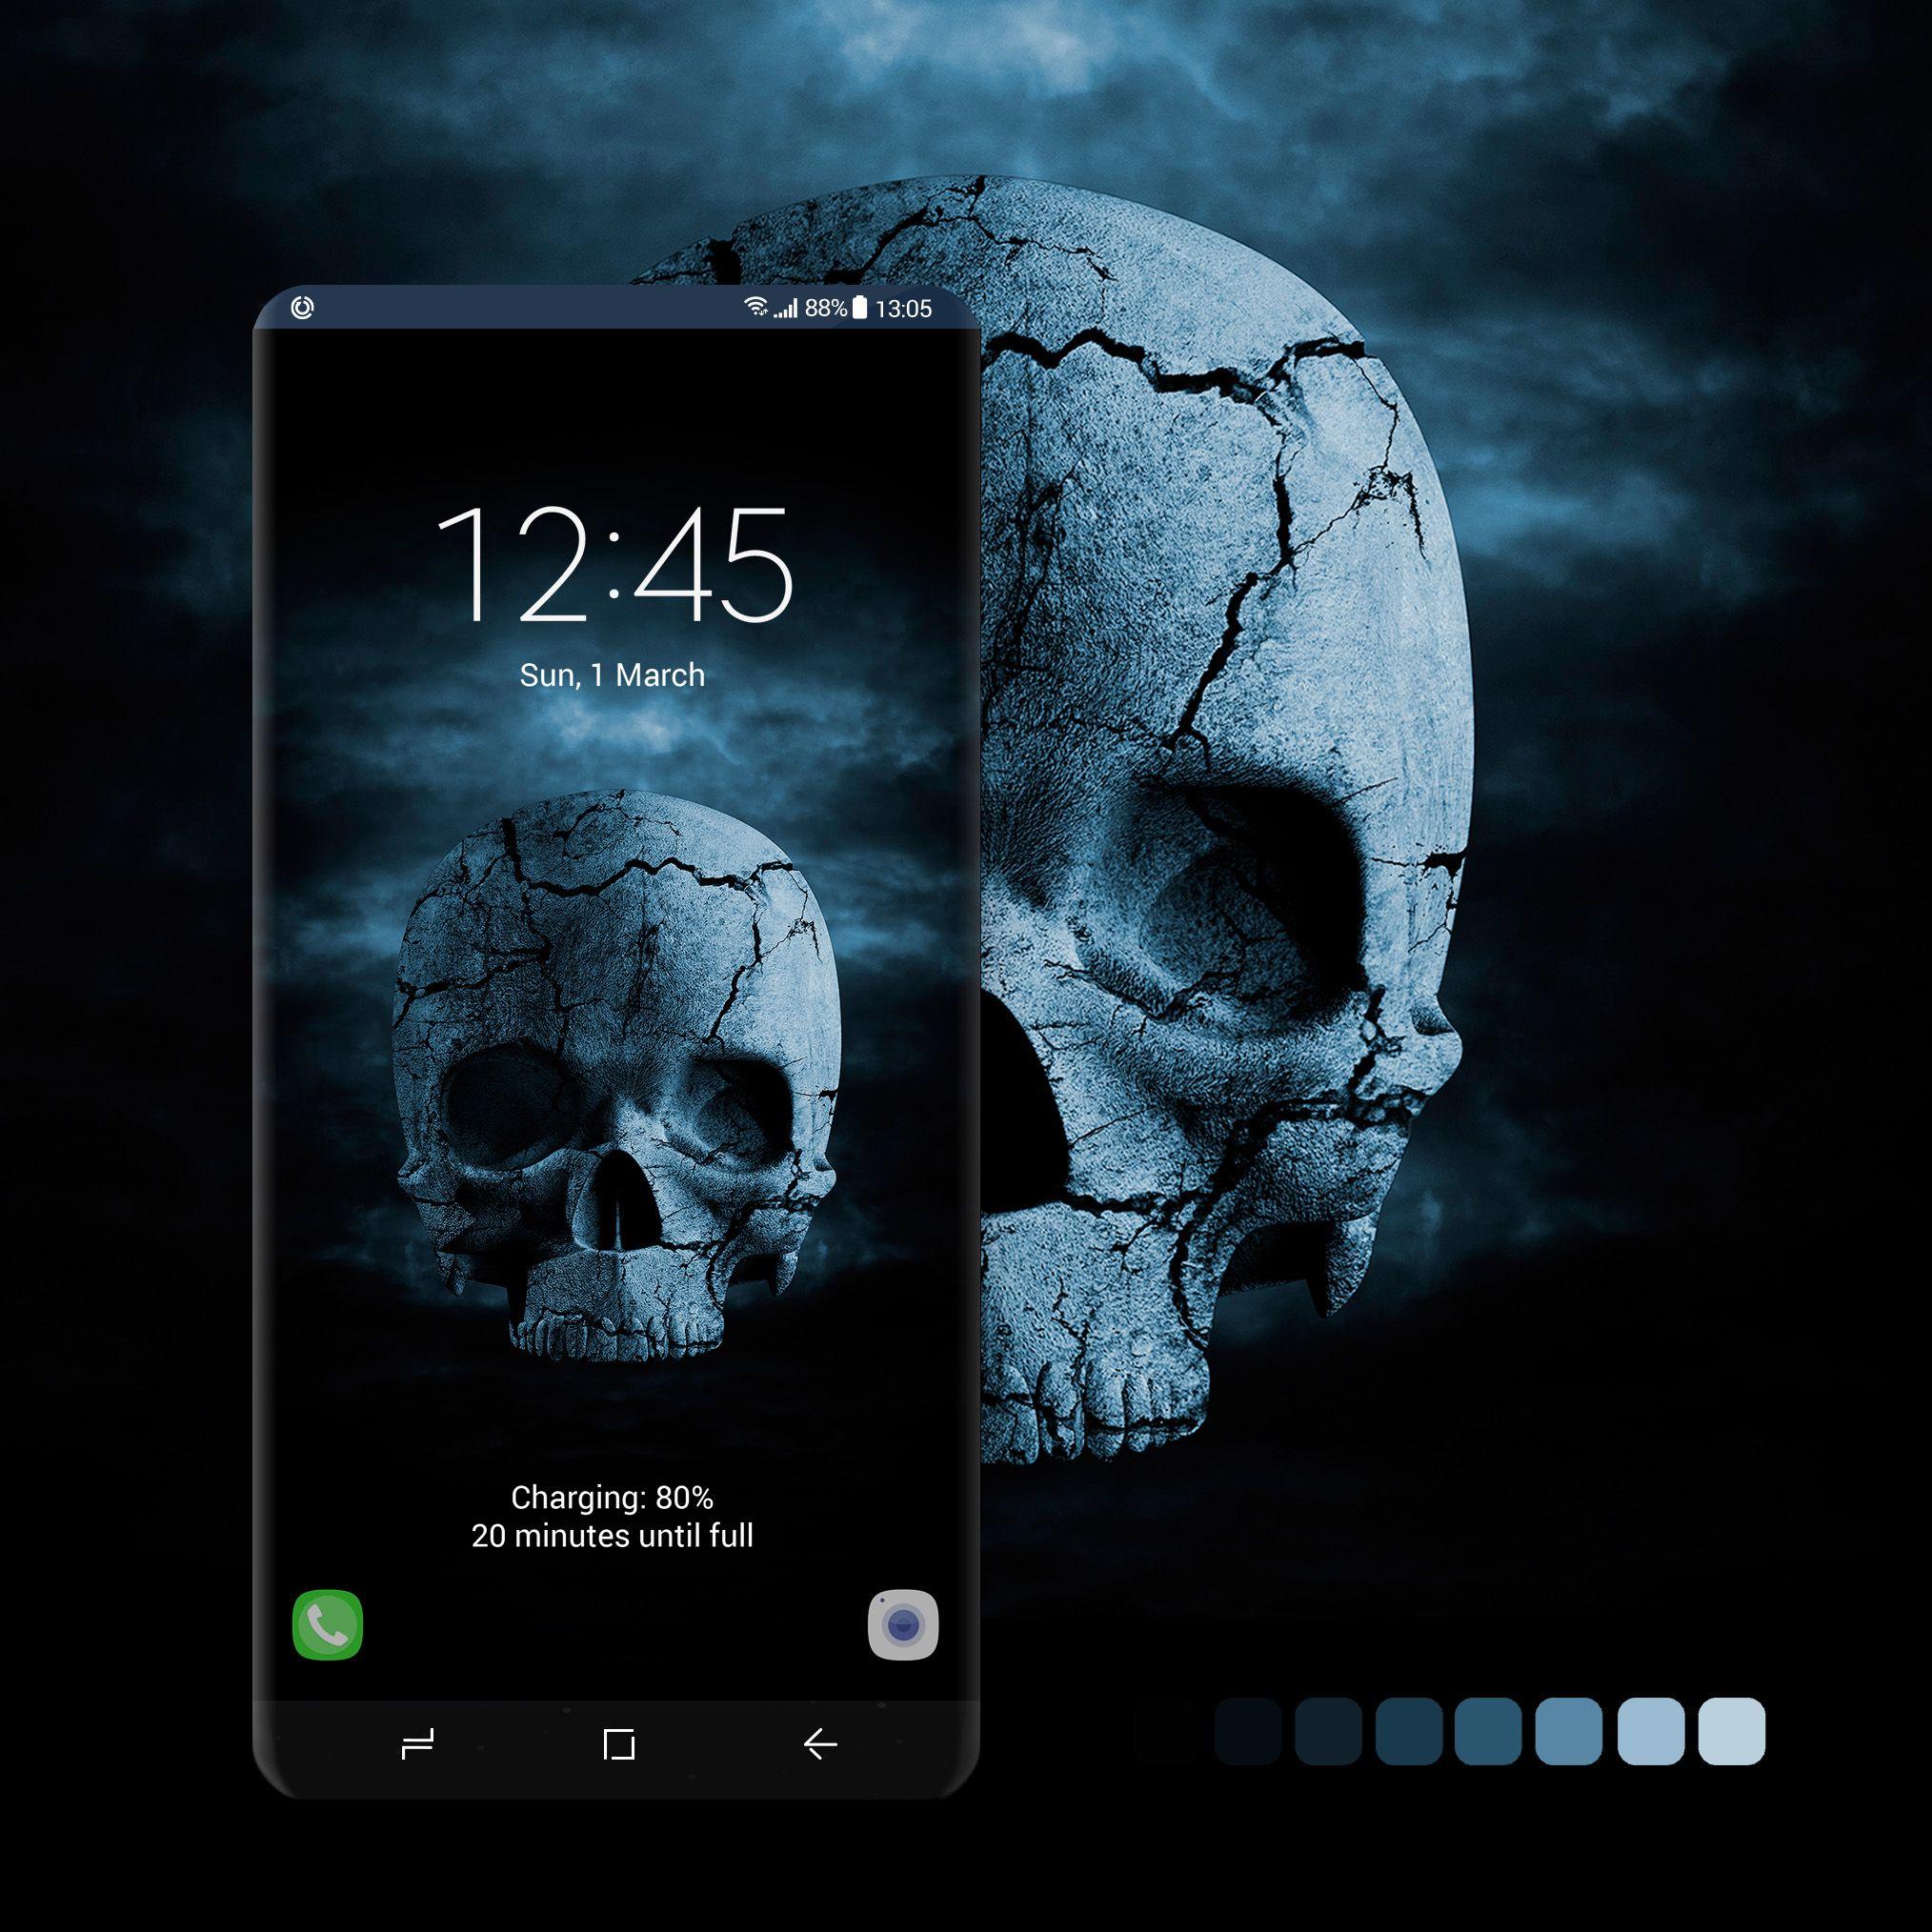 Blue Spooky Skull Wallpaper Wallpaper Android Phone